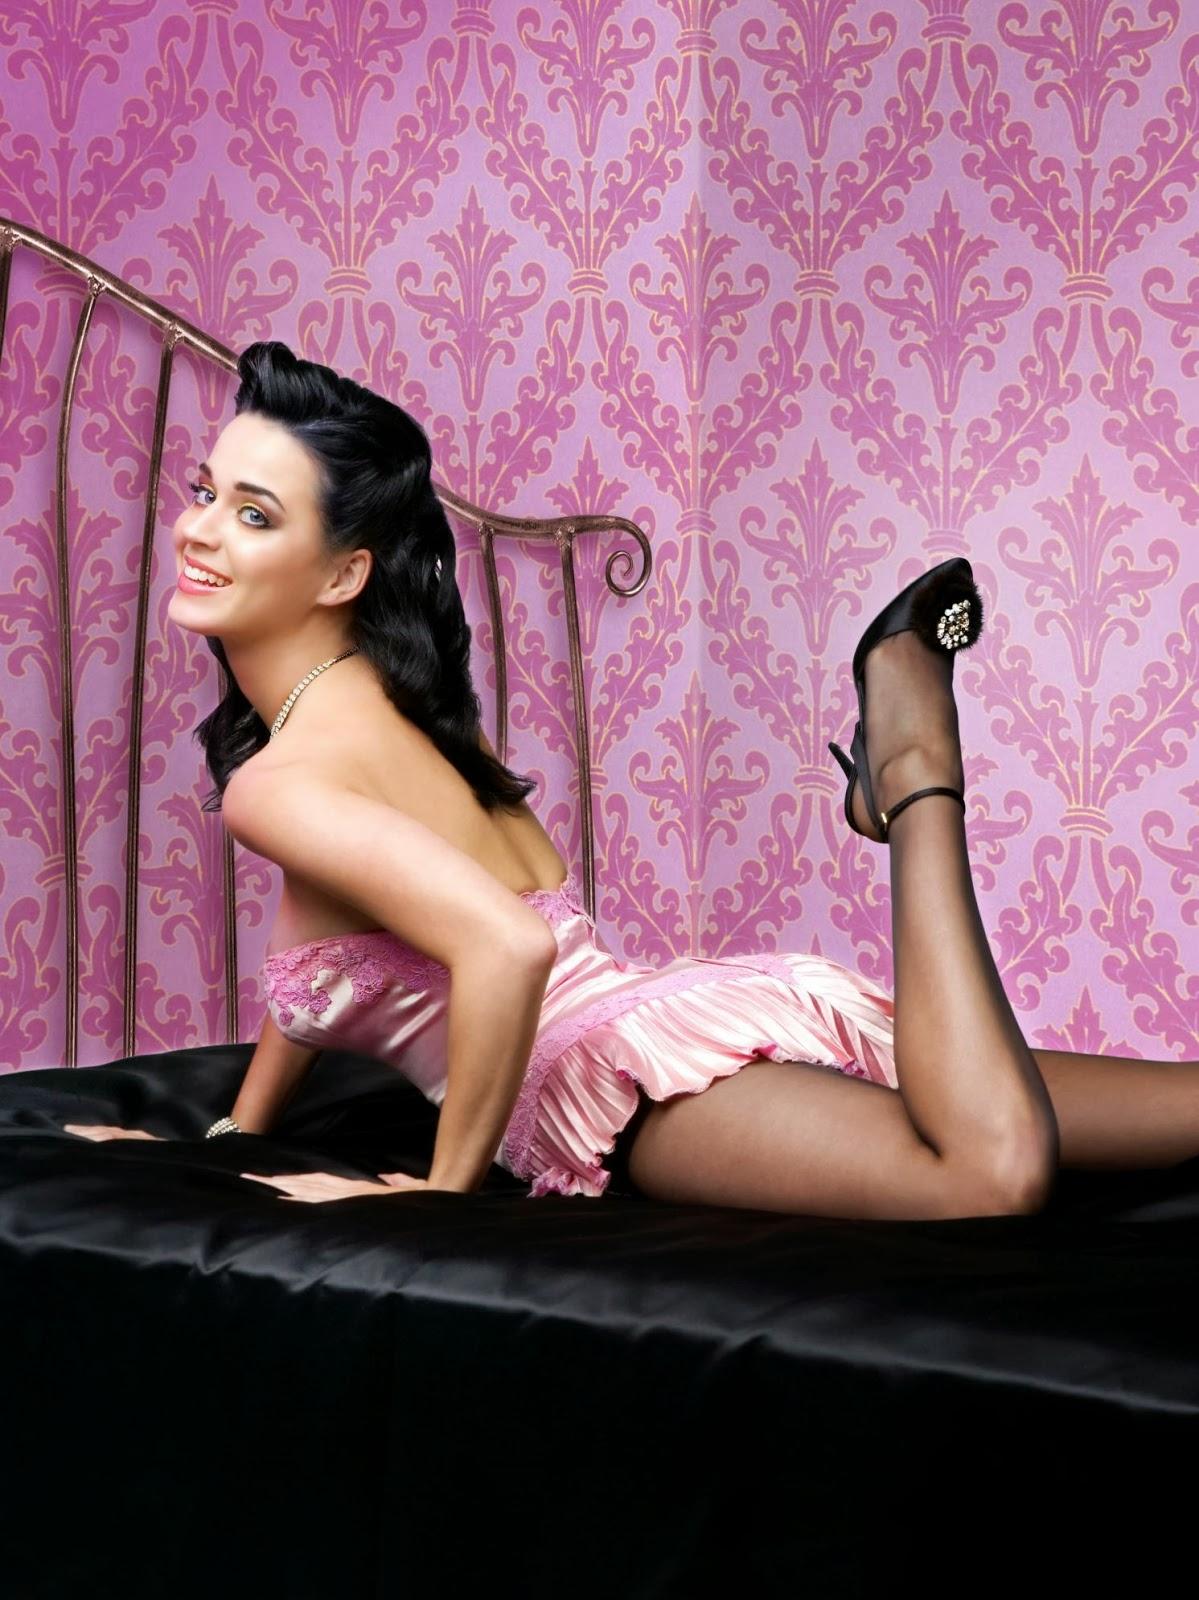 katy pery in lingerie